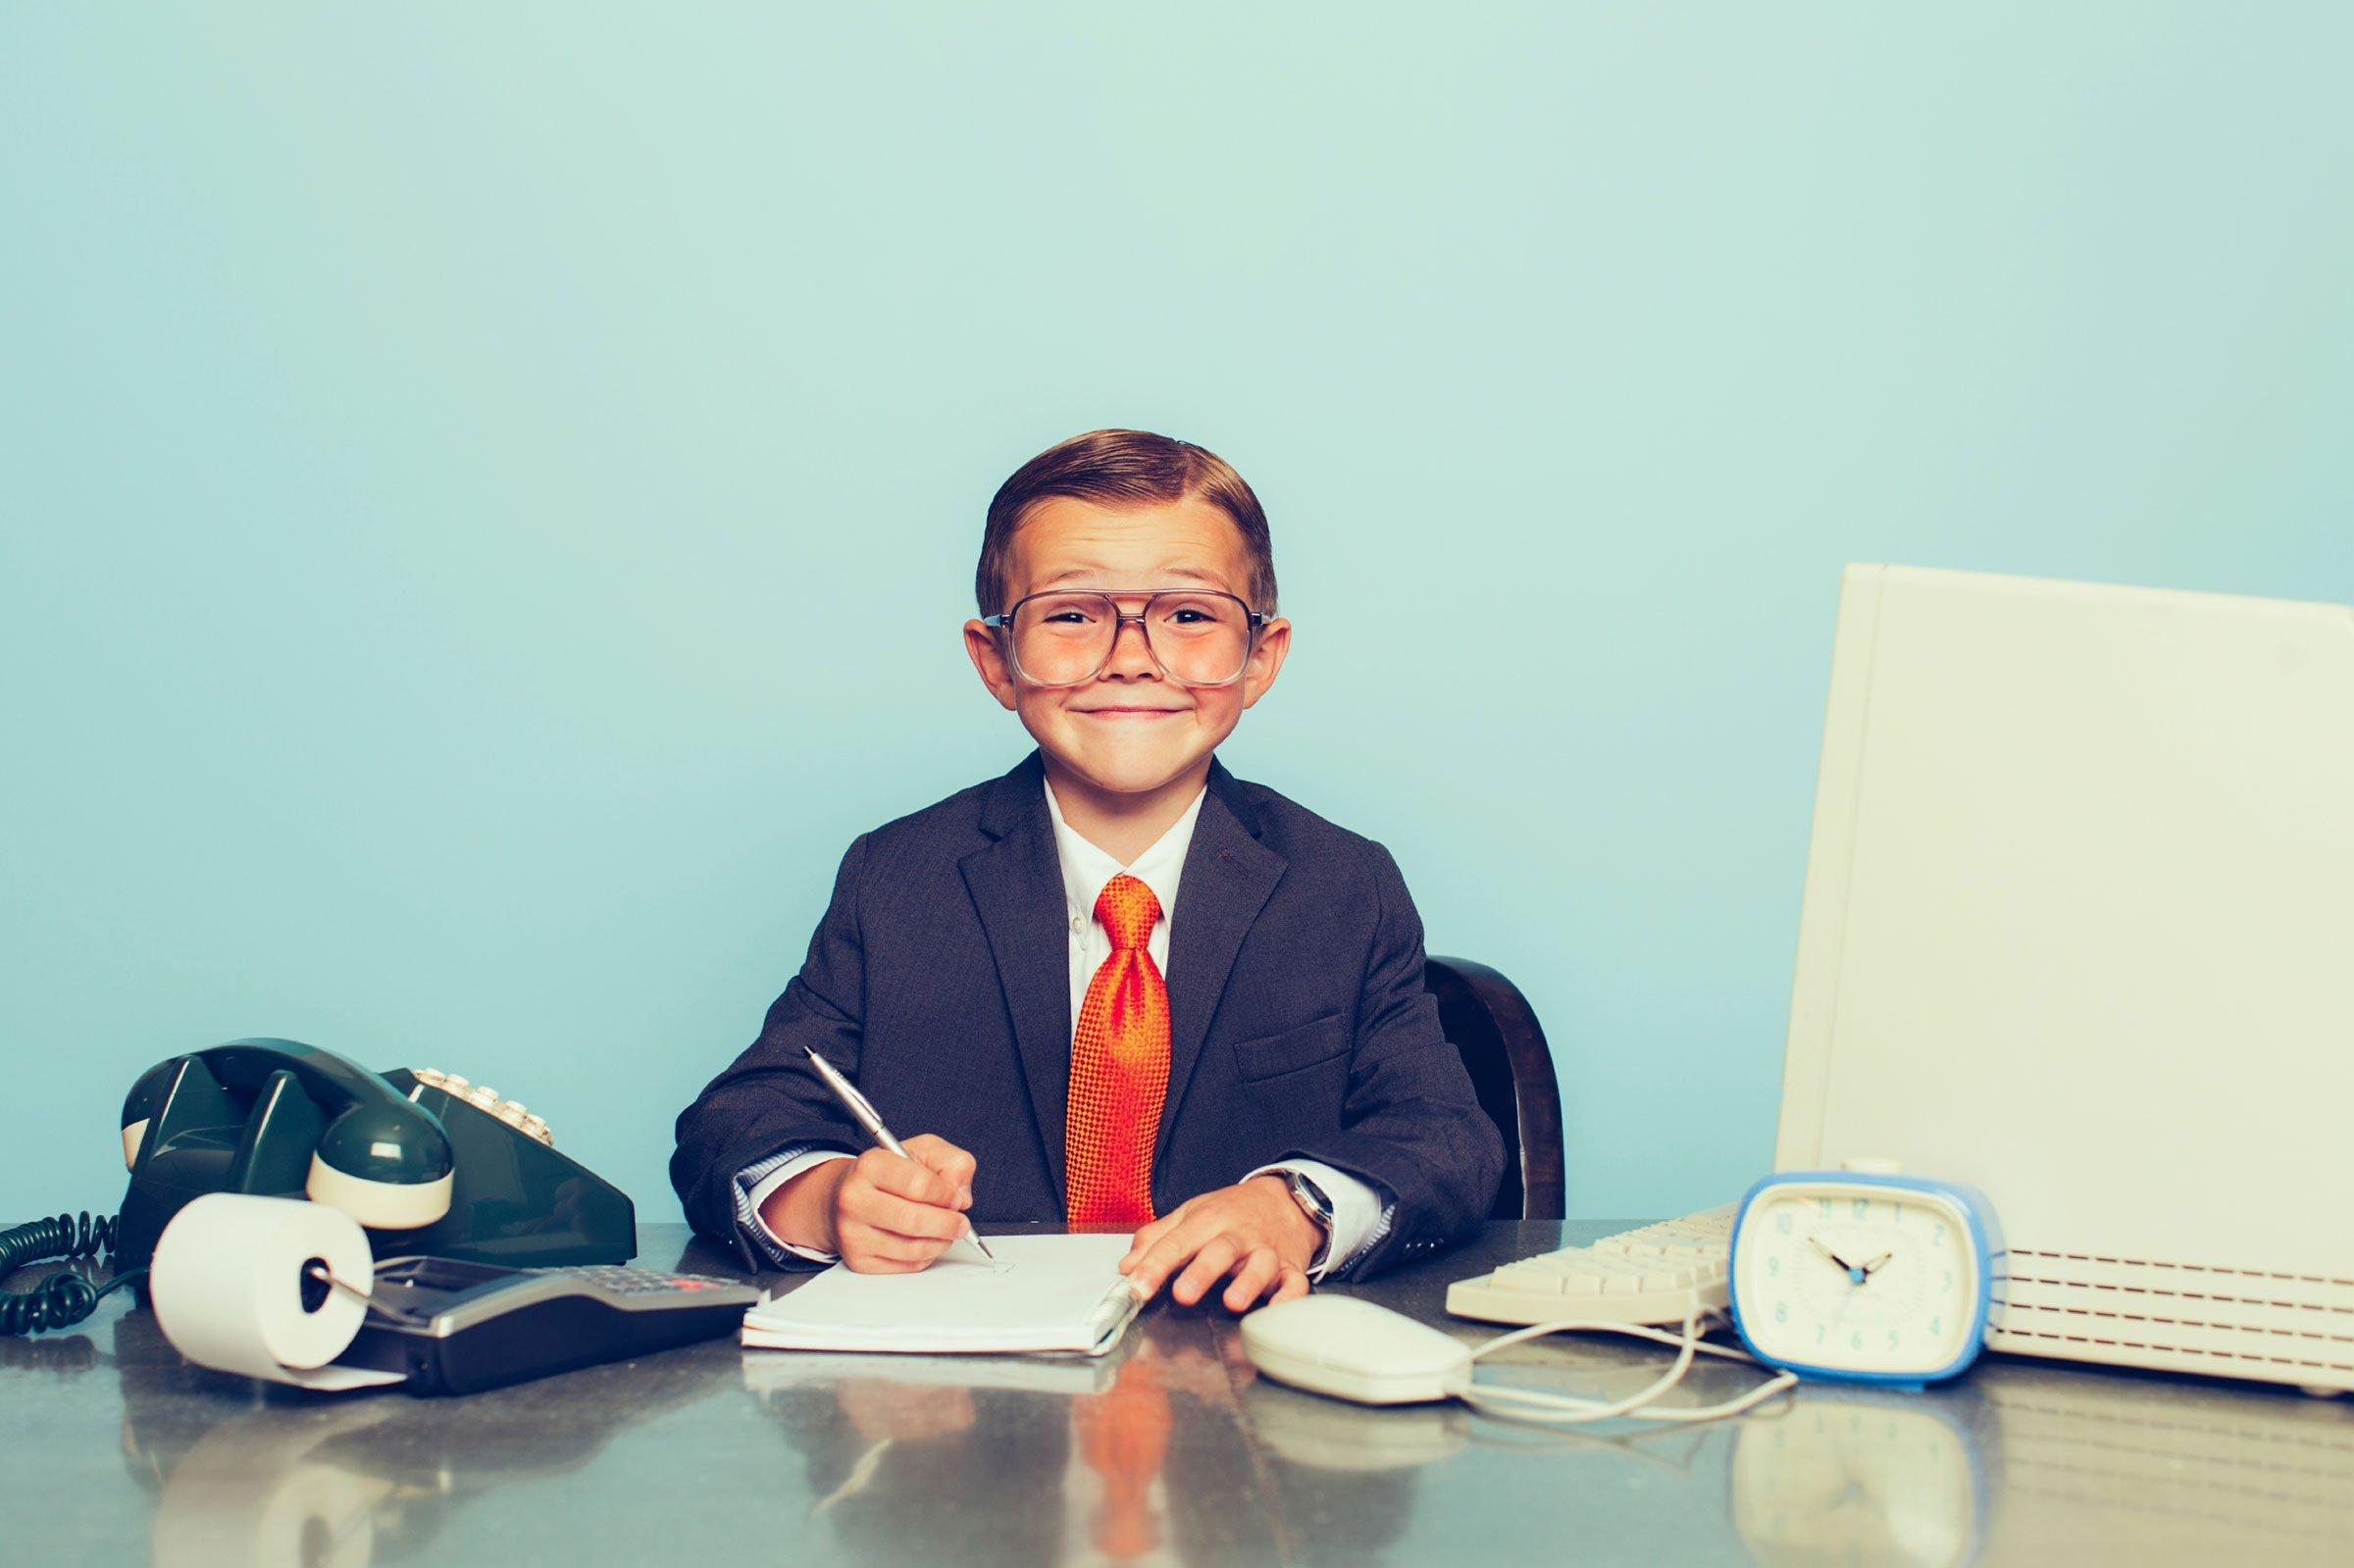 My-Online-Tax-Accountant.com